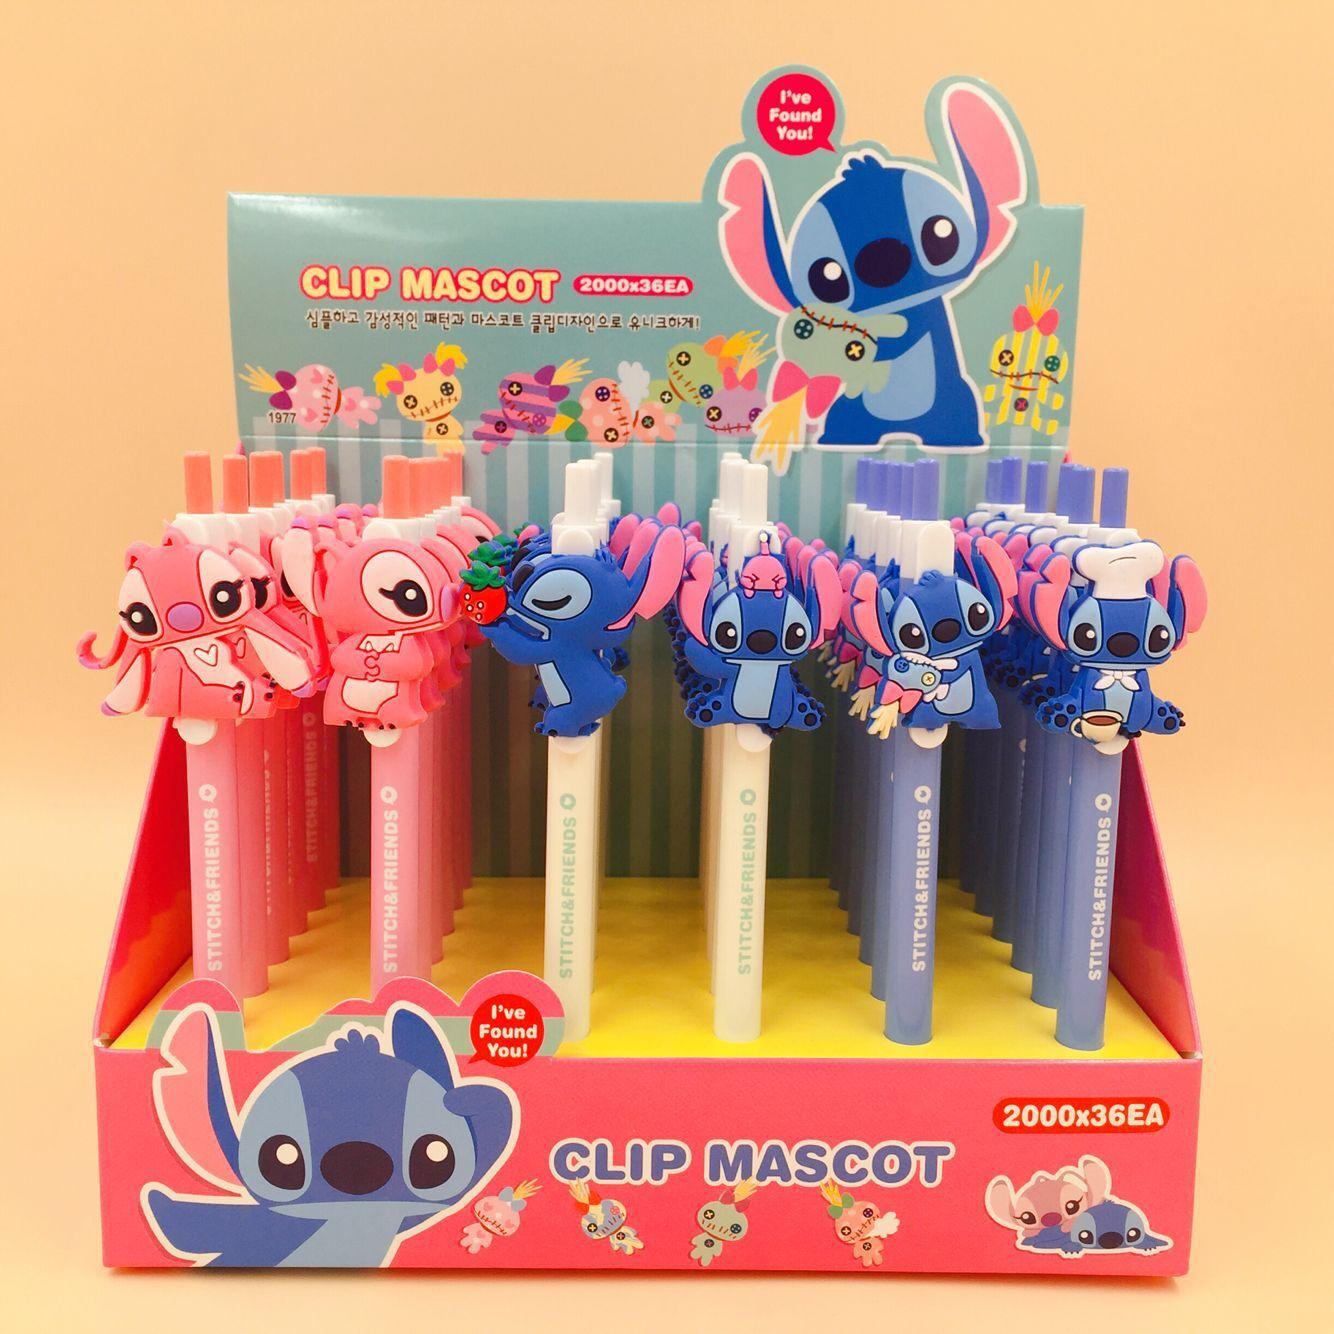 Stitch Monster Press Ballpoint Pen School Office Supply Gift Stationery Papelaria Escolar